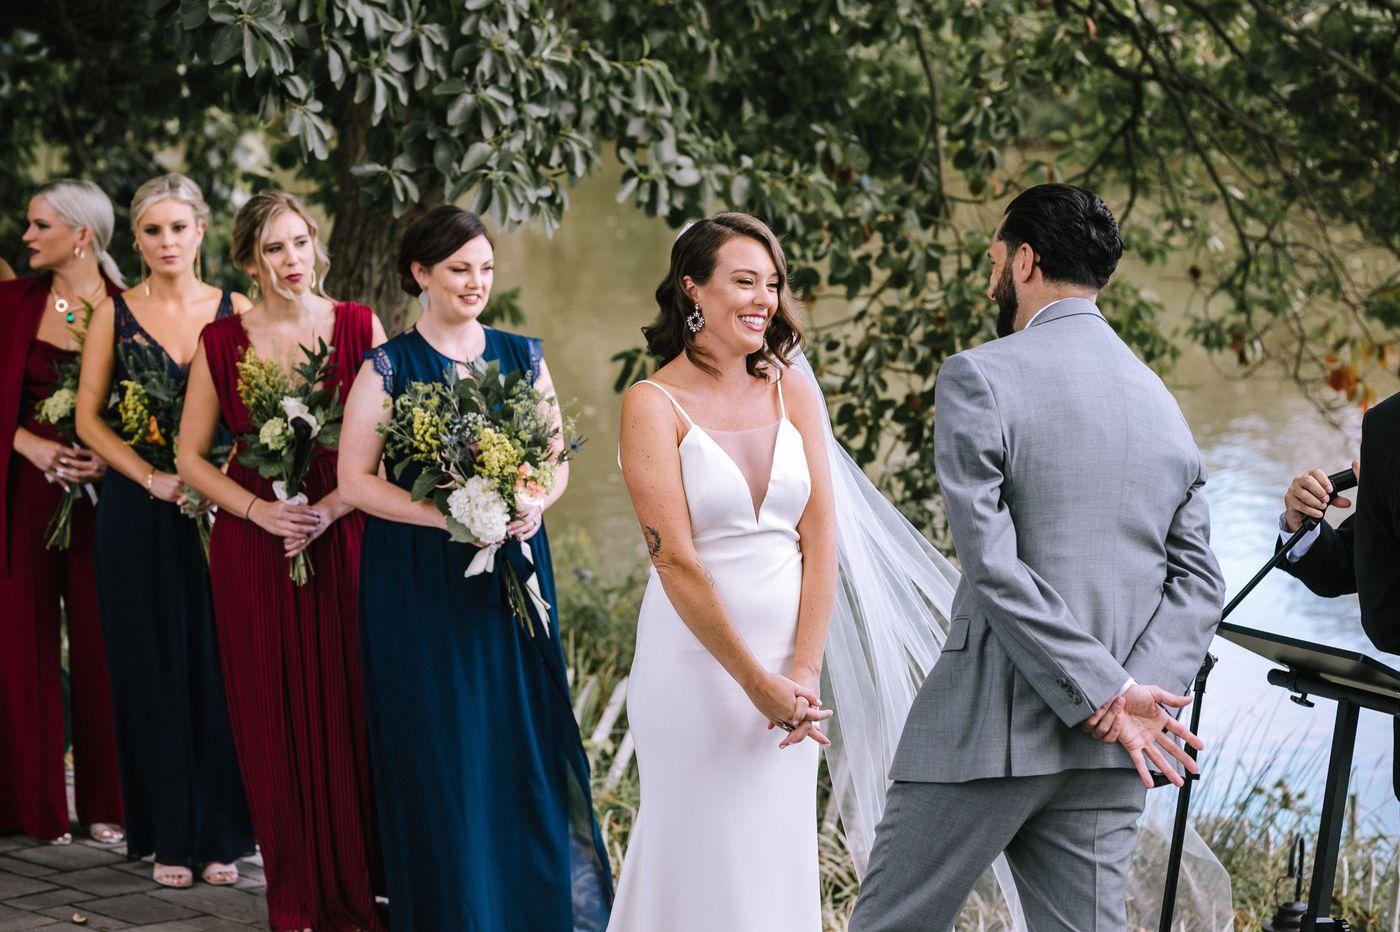 Philadelphia weddings: Megan Foley and John Taylor III